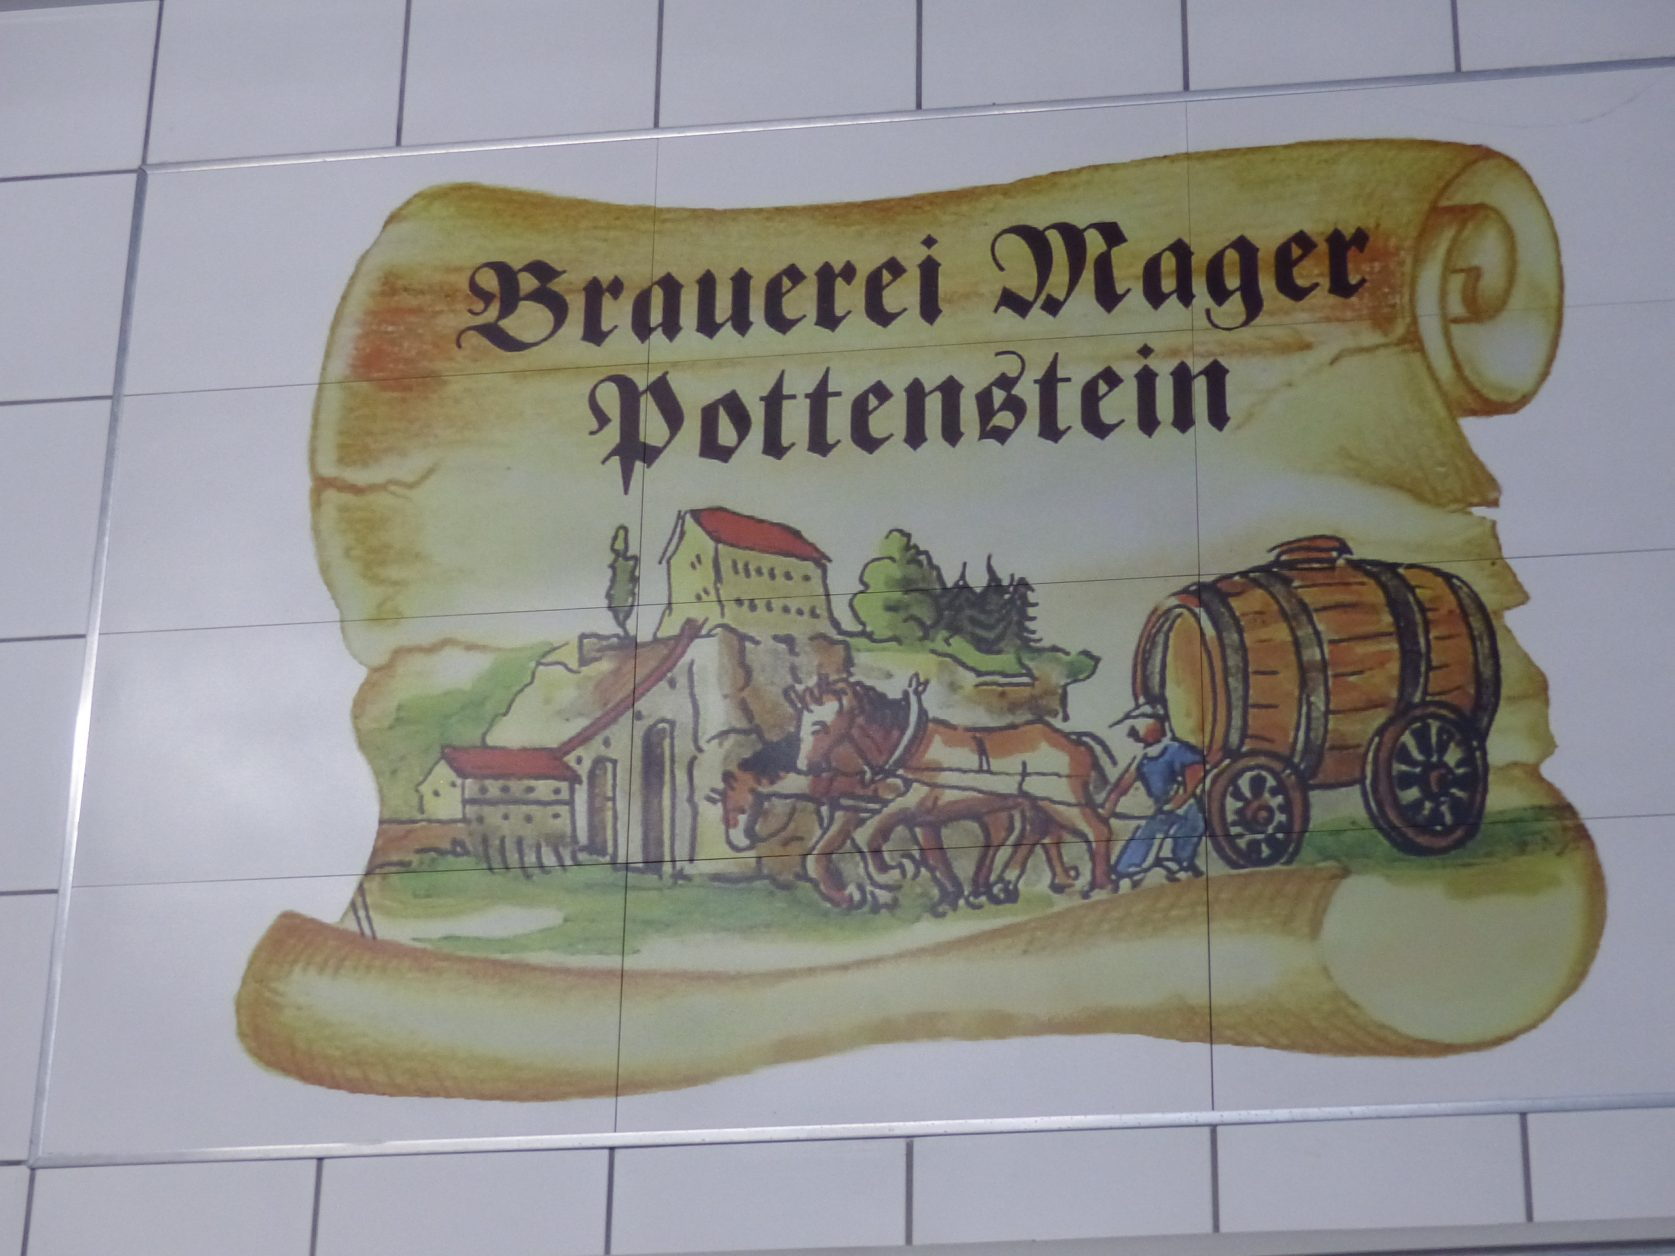 Brauerei Mager) (17)